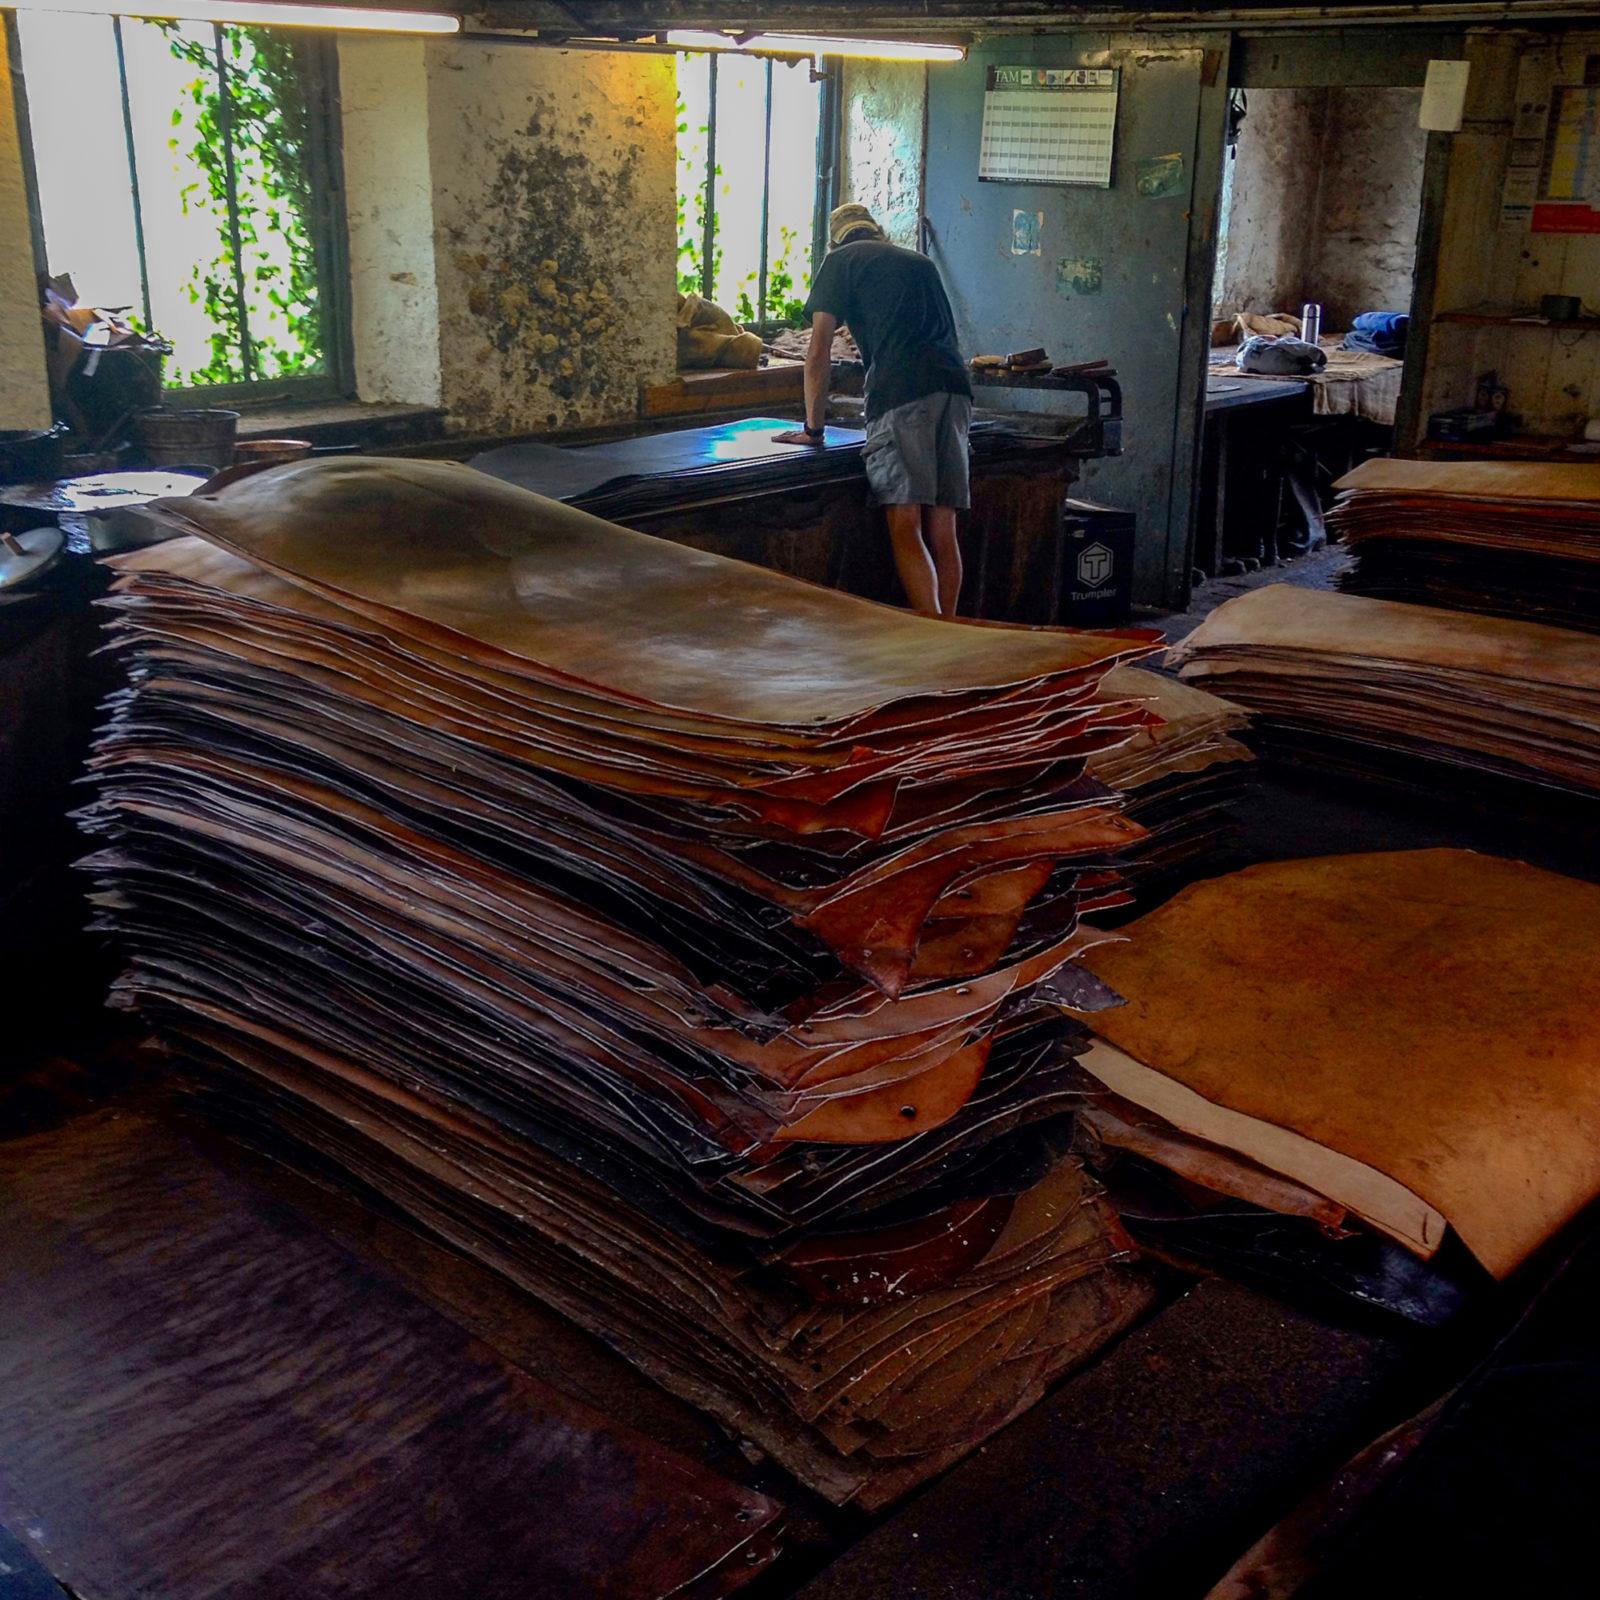 Applying tallow to oak bark tanned leather at J & FJ Baker Ltd